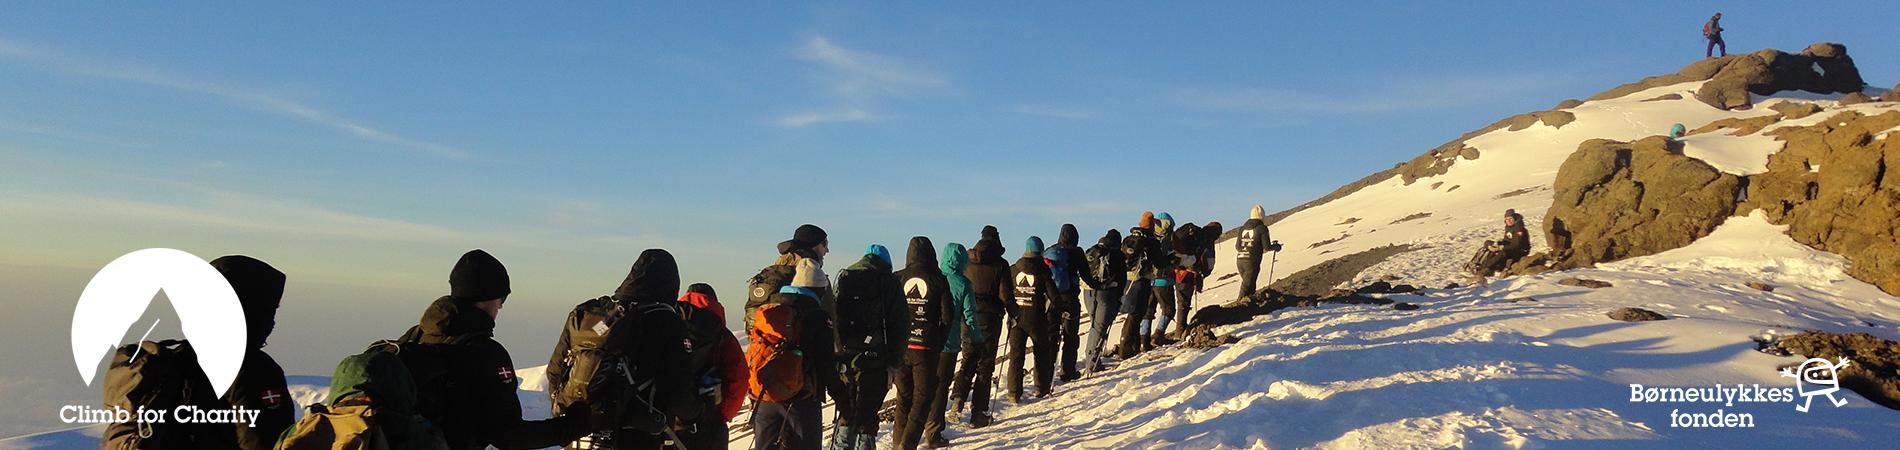 Kilimanjaro Galleri